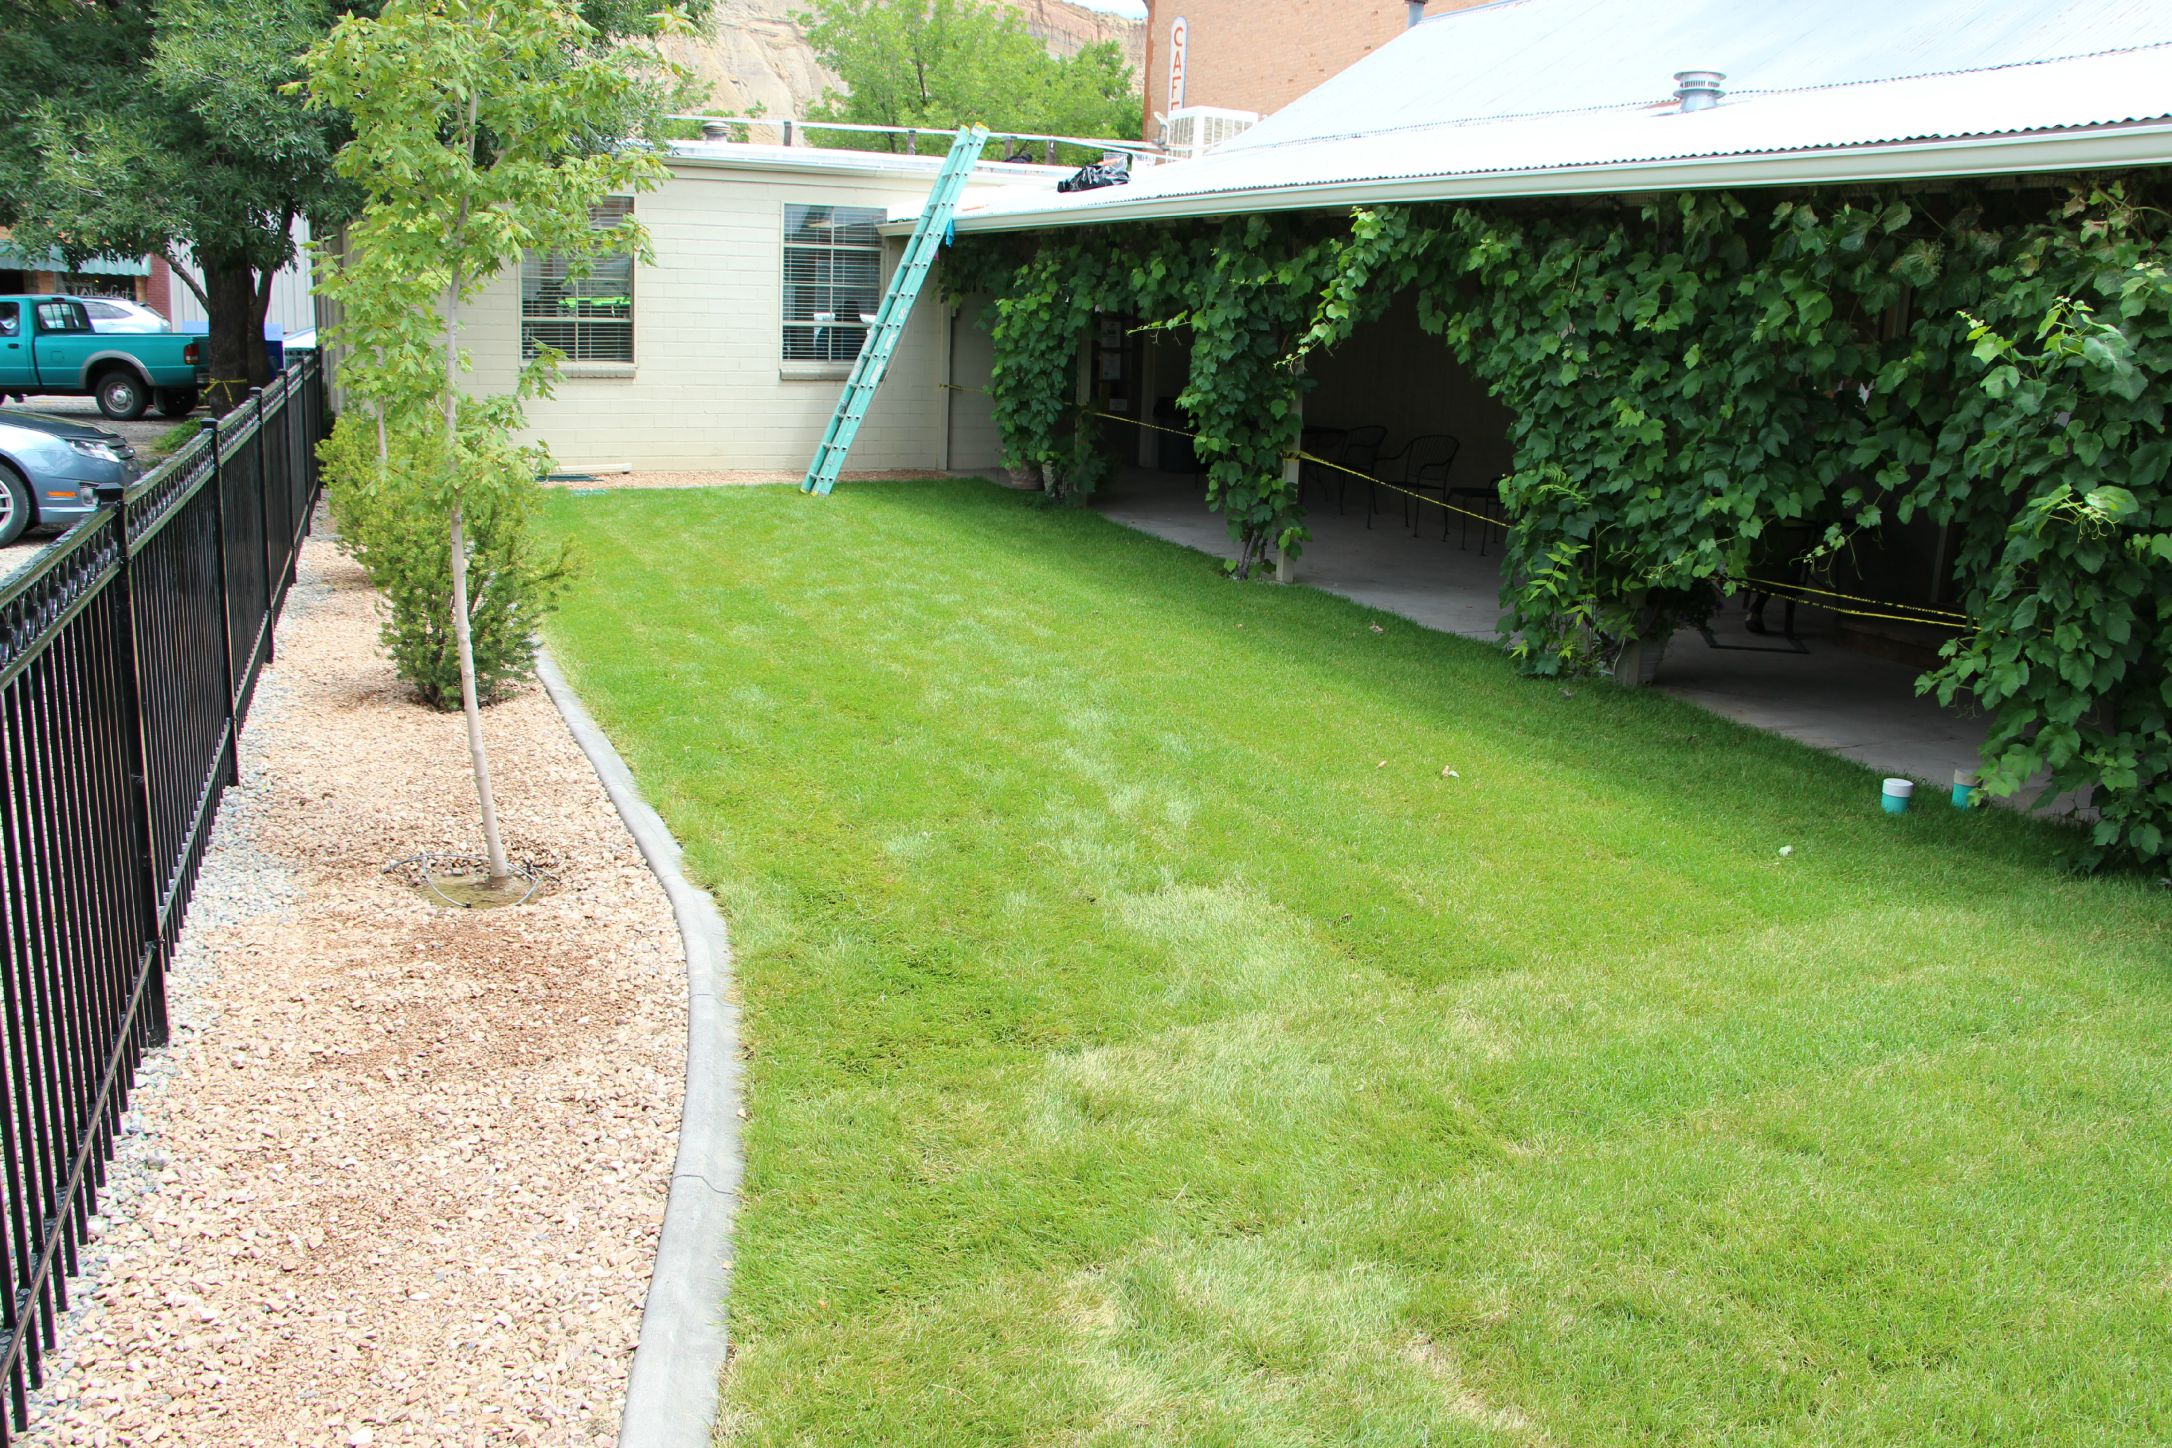 -Palisade Branch landscaping 7-24-15